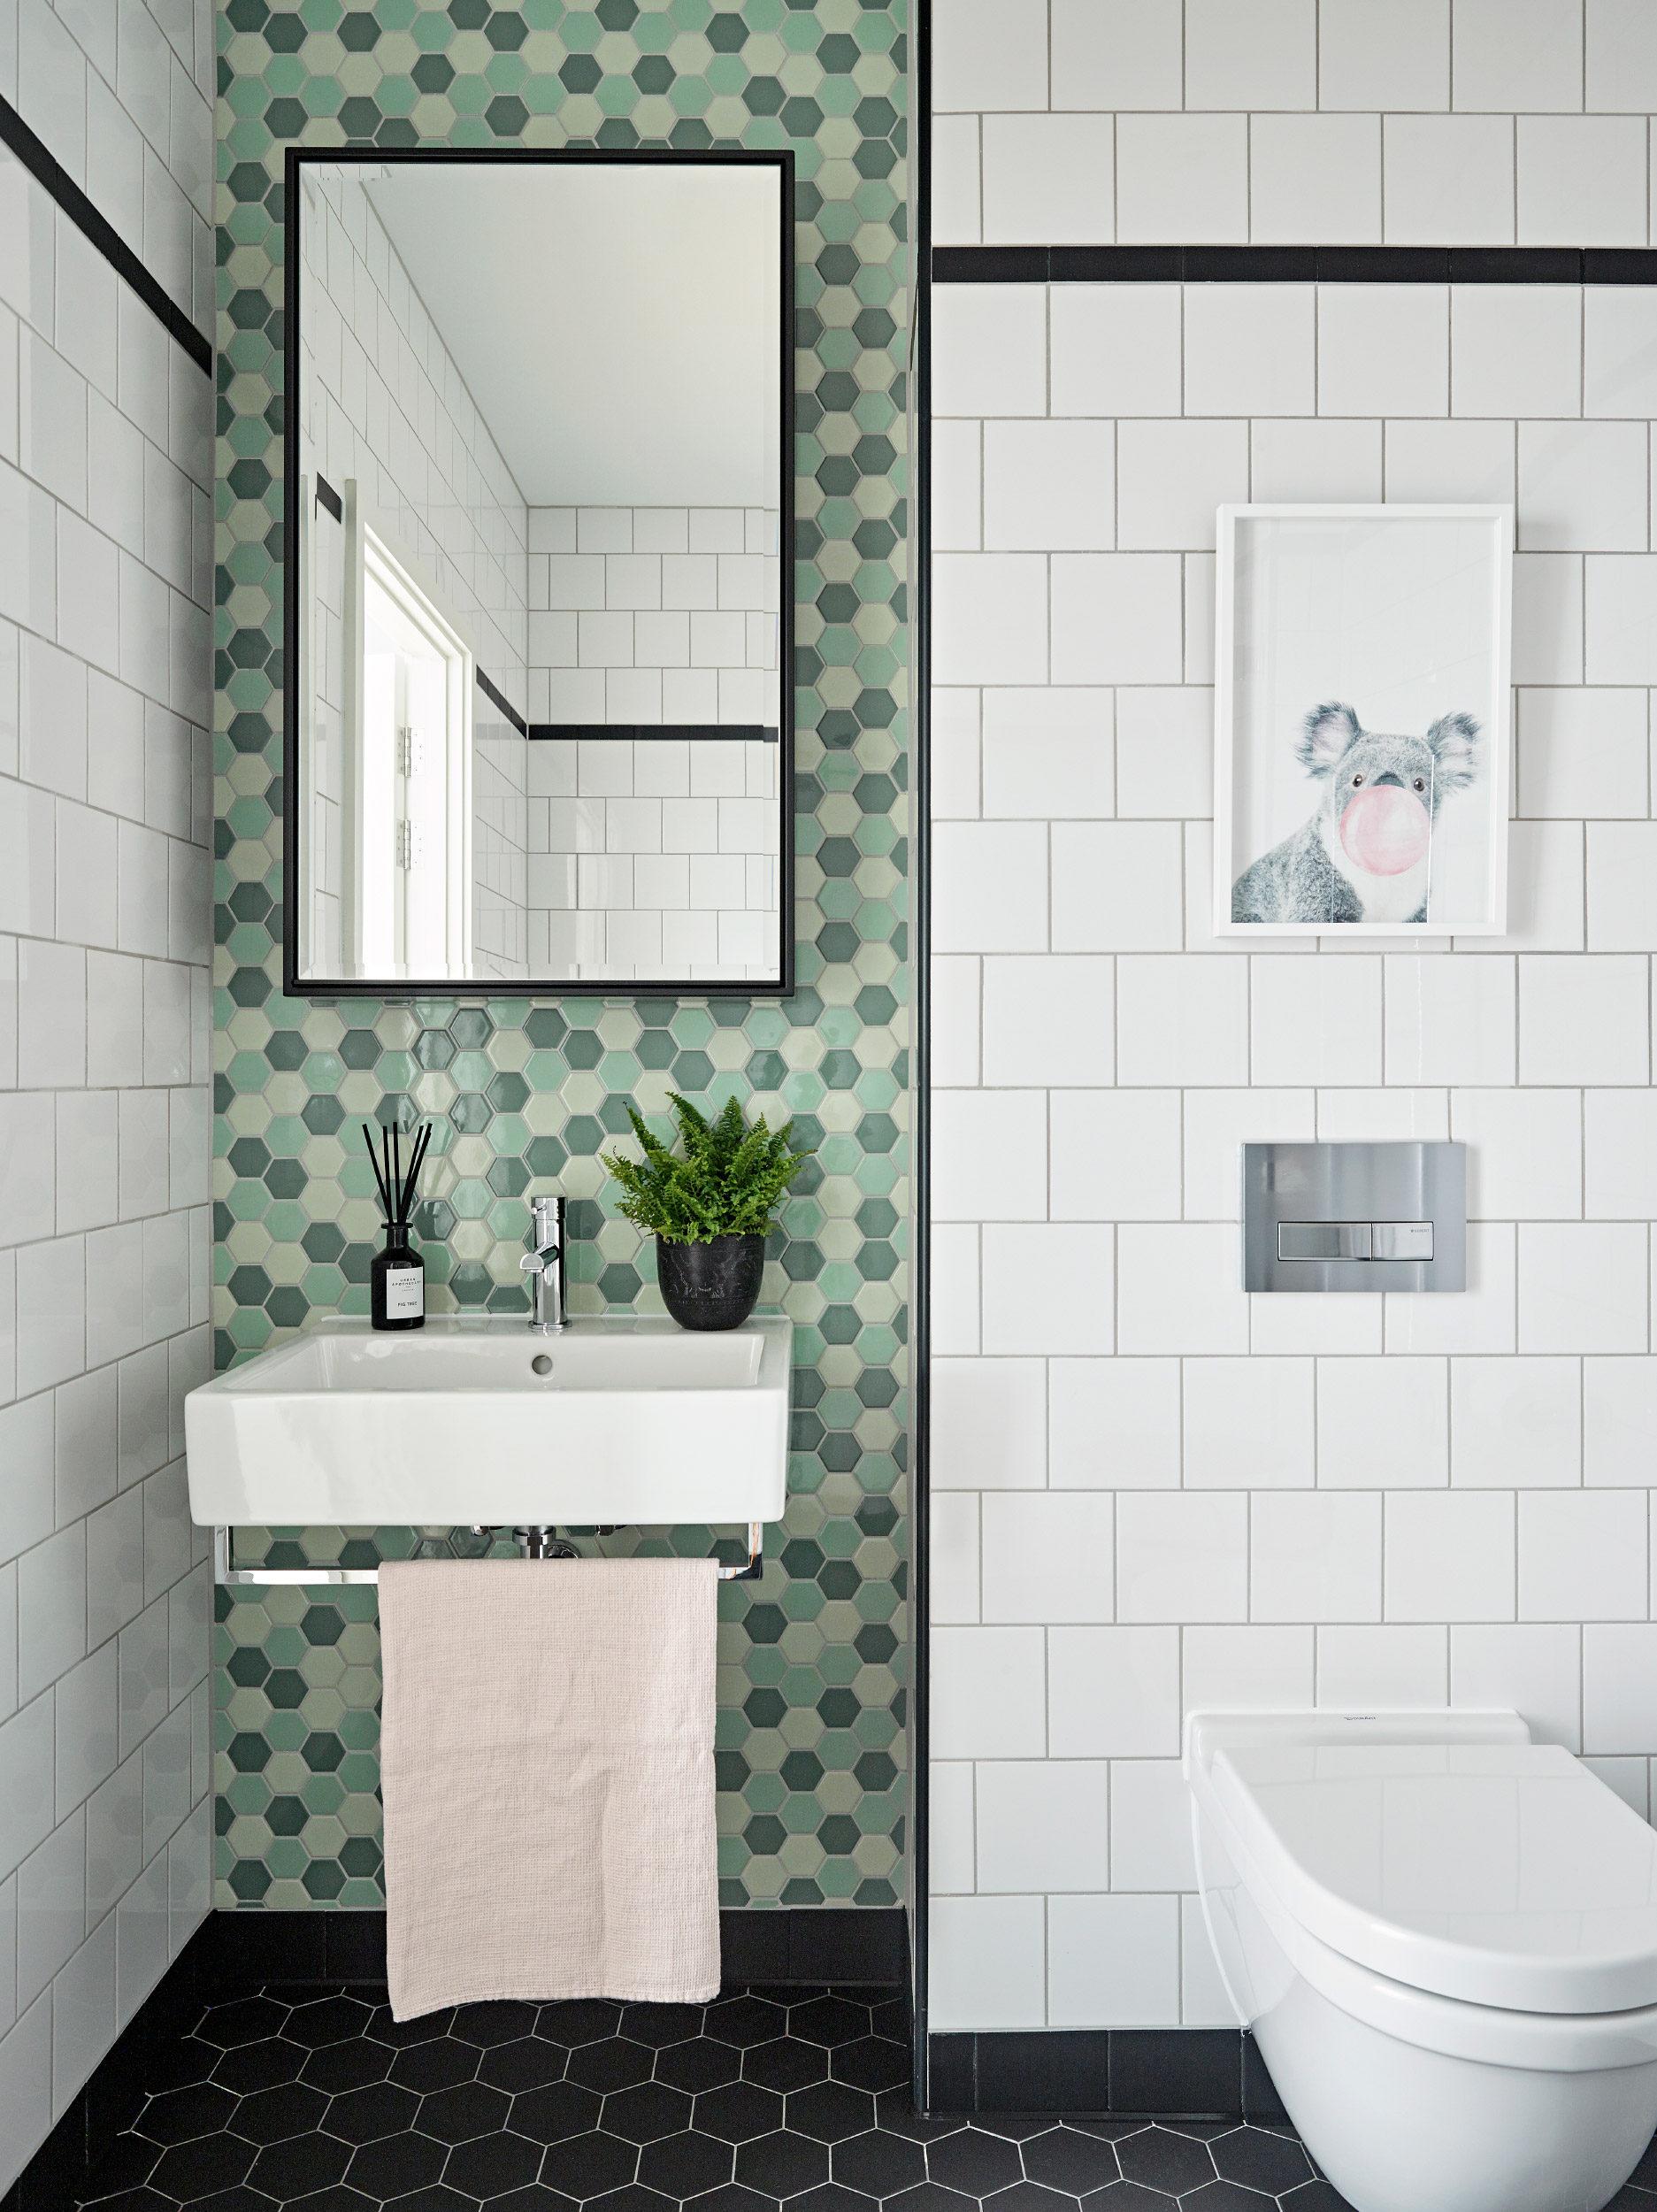 baie cu faianta verde